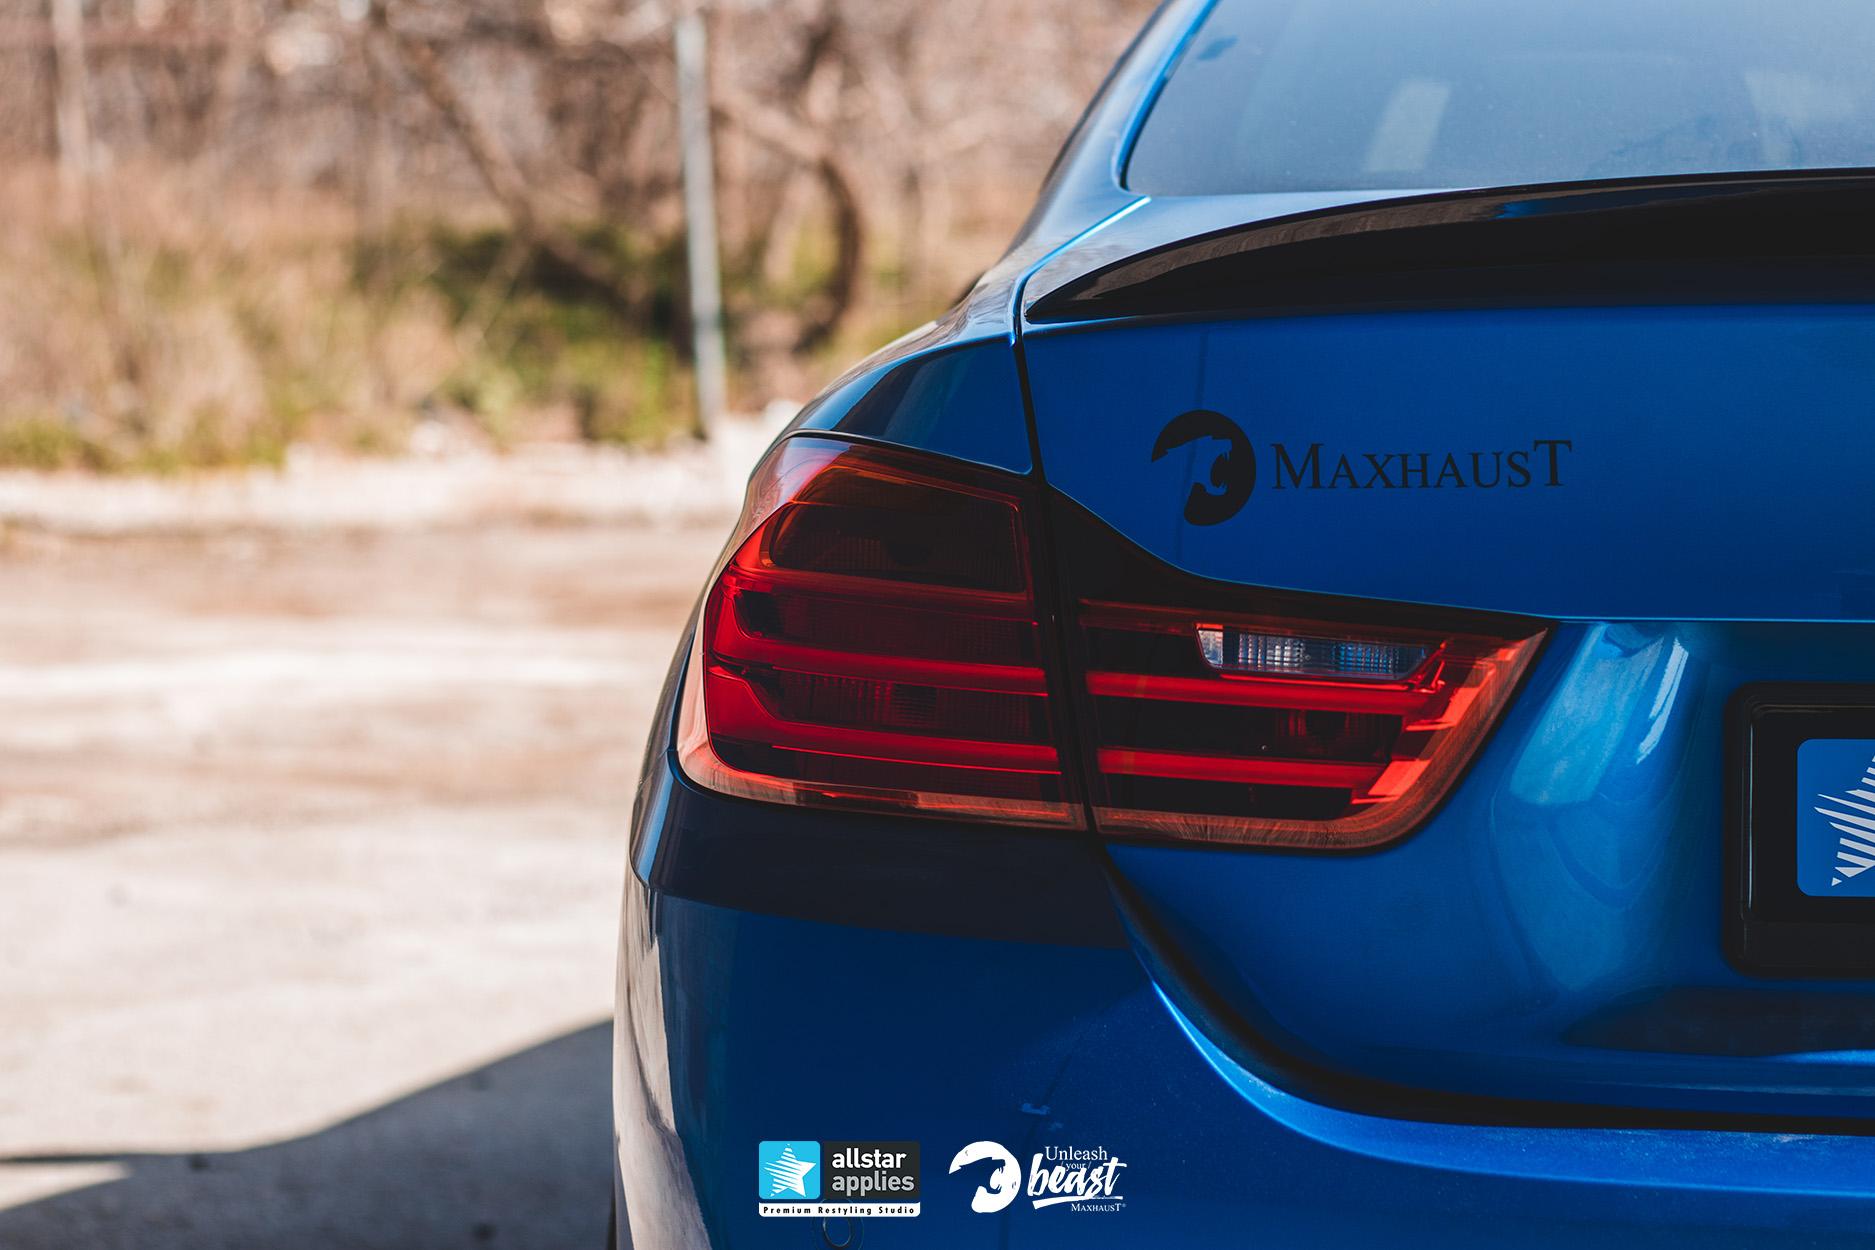 BMW MAXHAUST M4 7